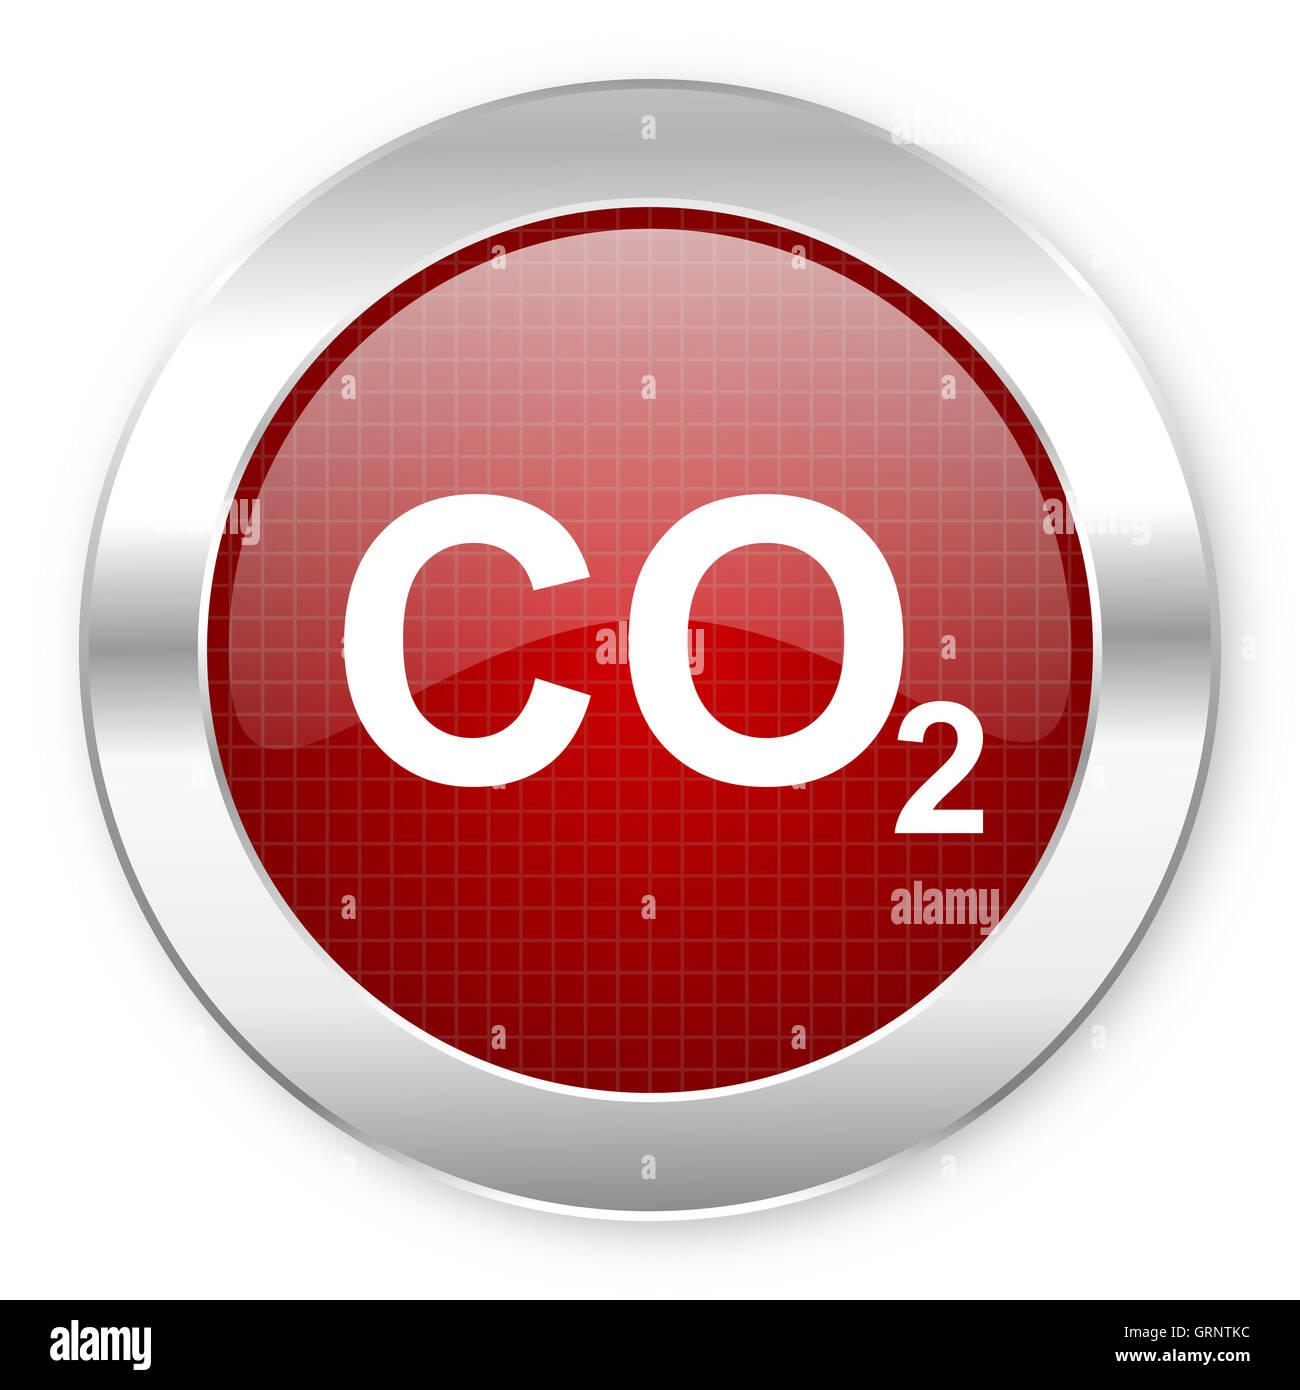 Icono de dióxido de carbono Imagen De Stock